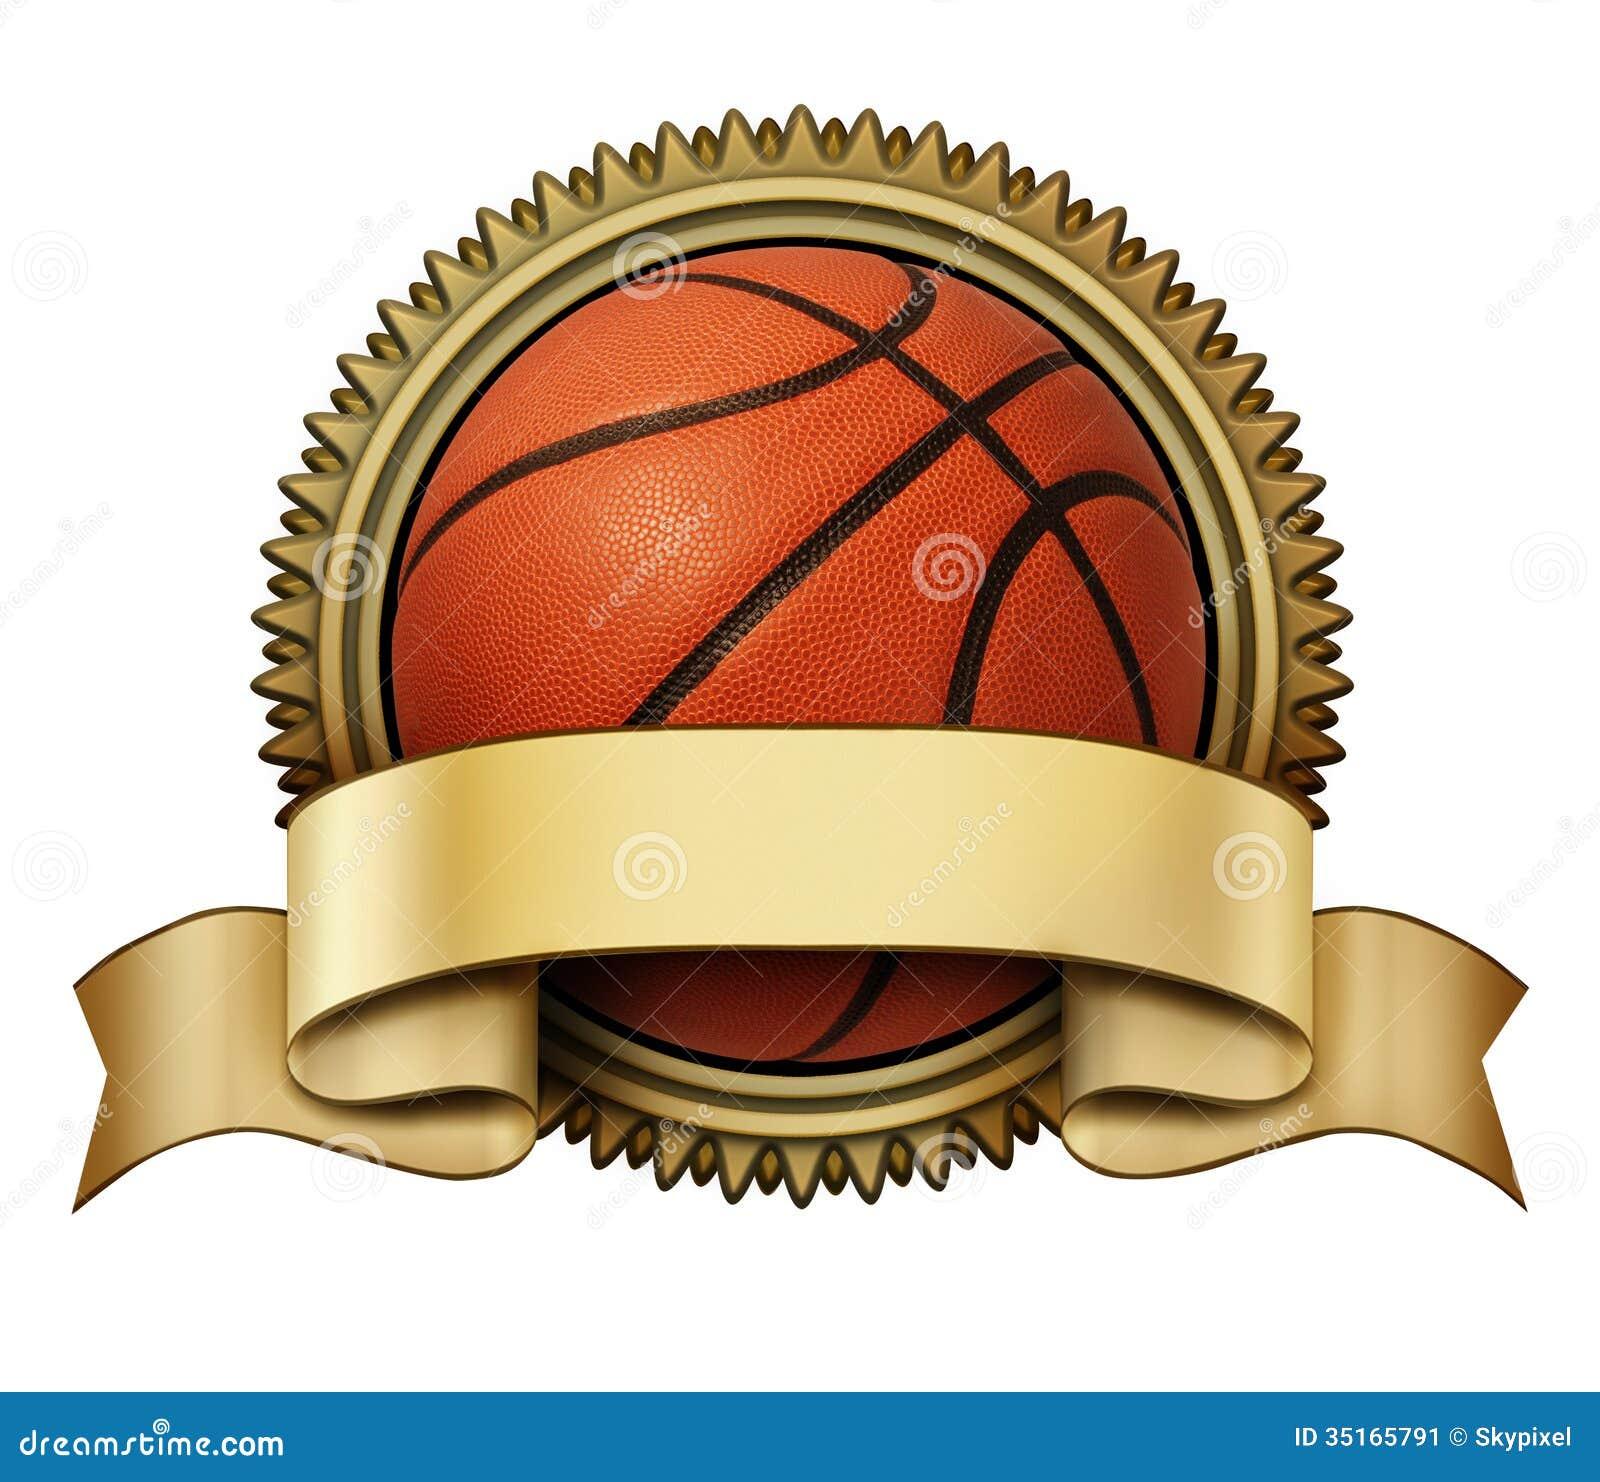 Basketball Award Stock Image - Image: 35165791